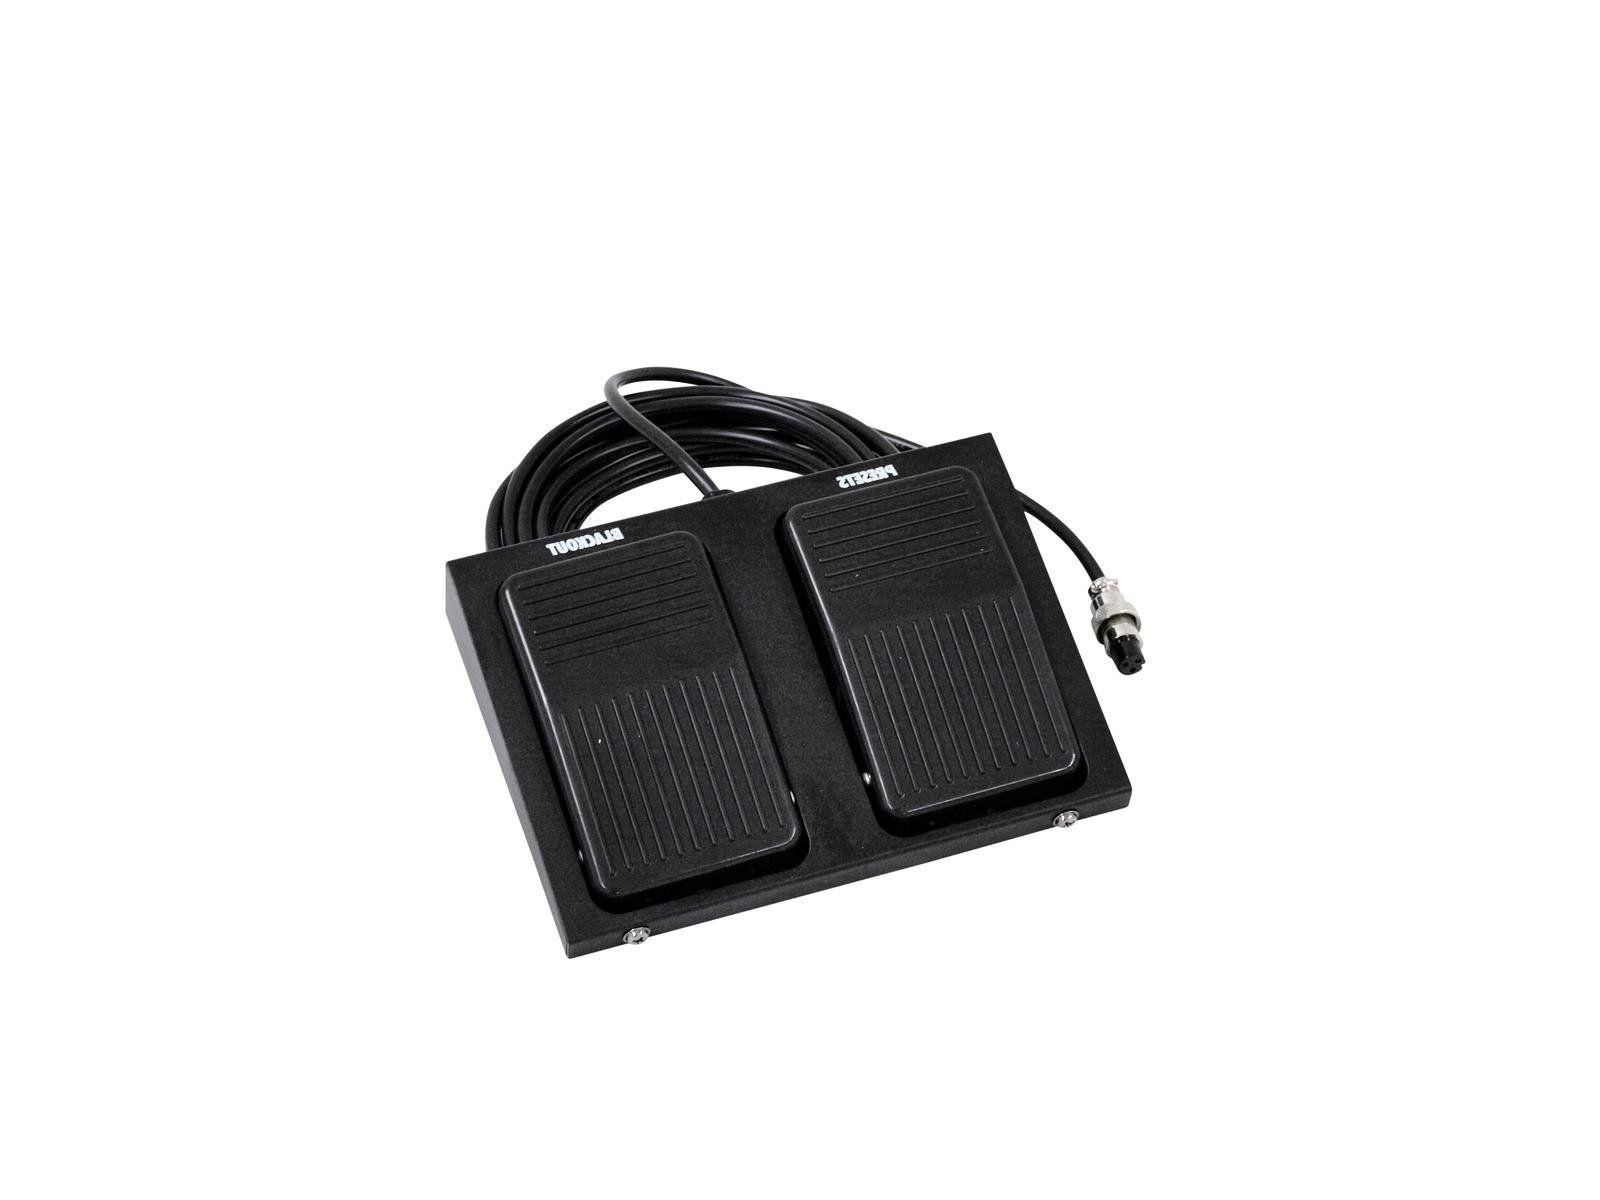 EUROLITE FP-2 Fußschalter für LED KLS-150 Lichtset, Retoure!!!